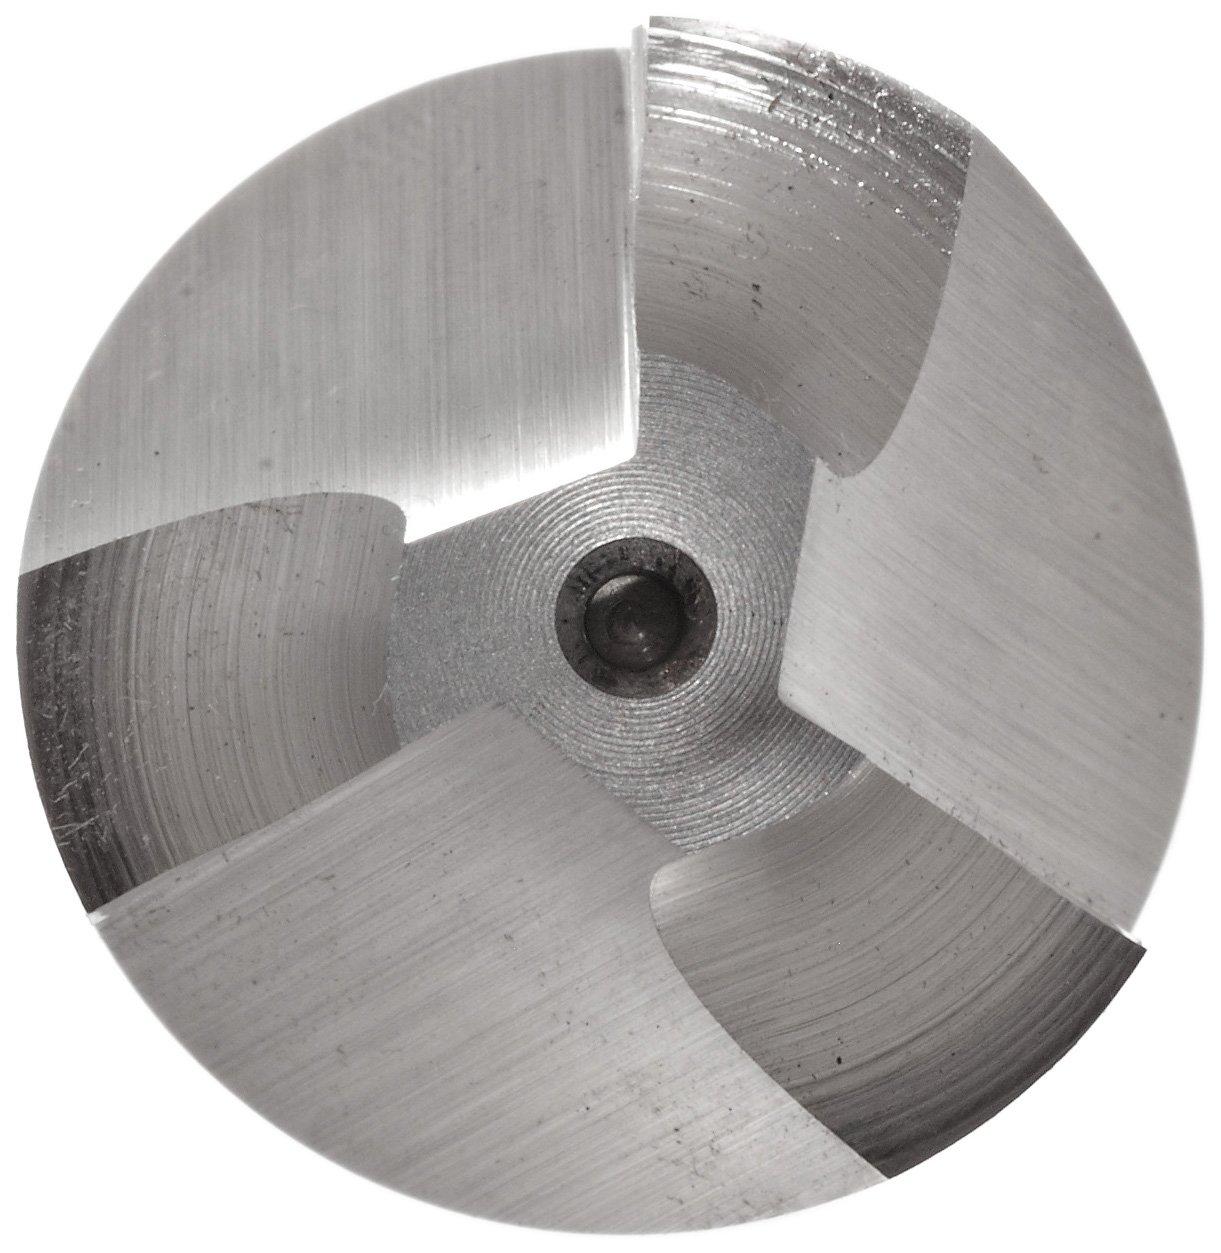 3 Flutes 30 Deg Helix 0.7500 Cutting Diameter Non-Center Cutting Melin Tool R Cobalt Steel Corner Rounding End Mill 0.75 Shank Diameter 3.1250 Overall Length Weldon Shank Uncoated Finish Bright